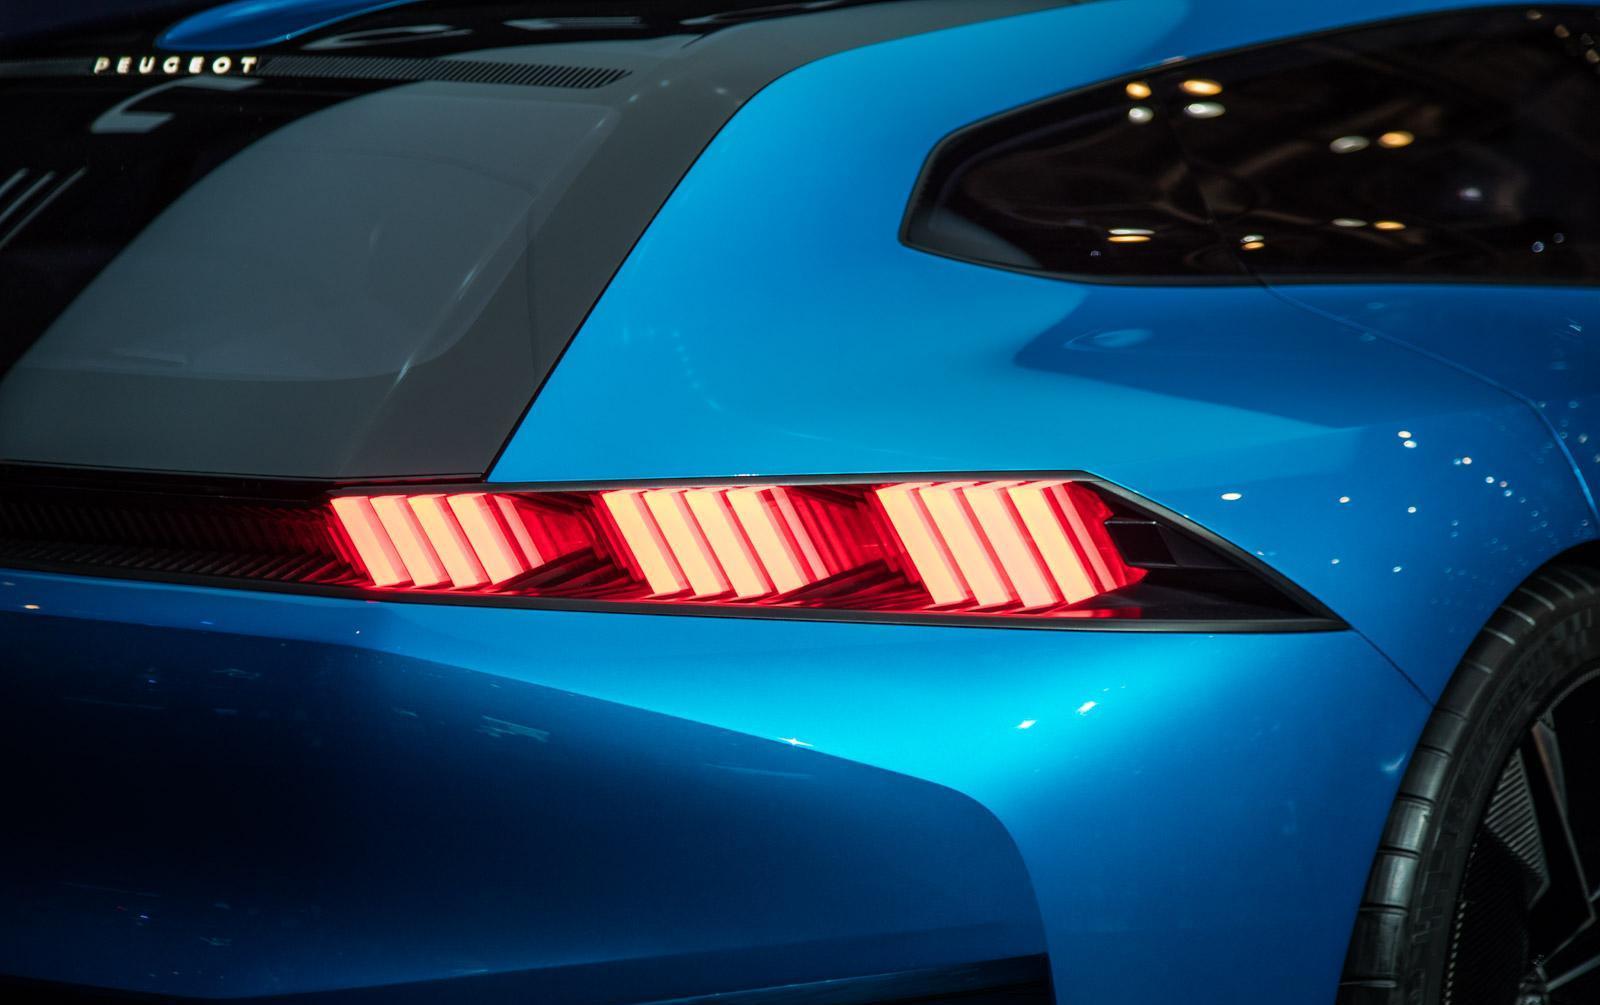 Peugeot-instinct-concept-016